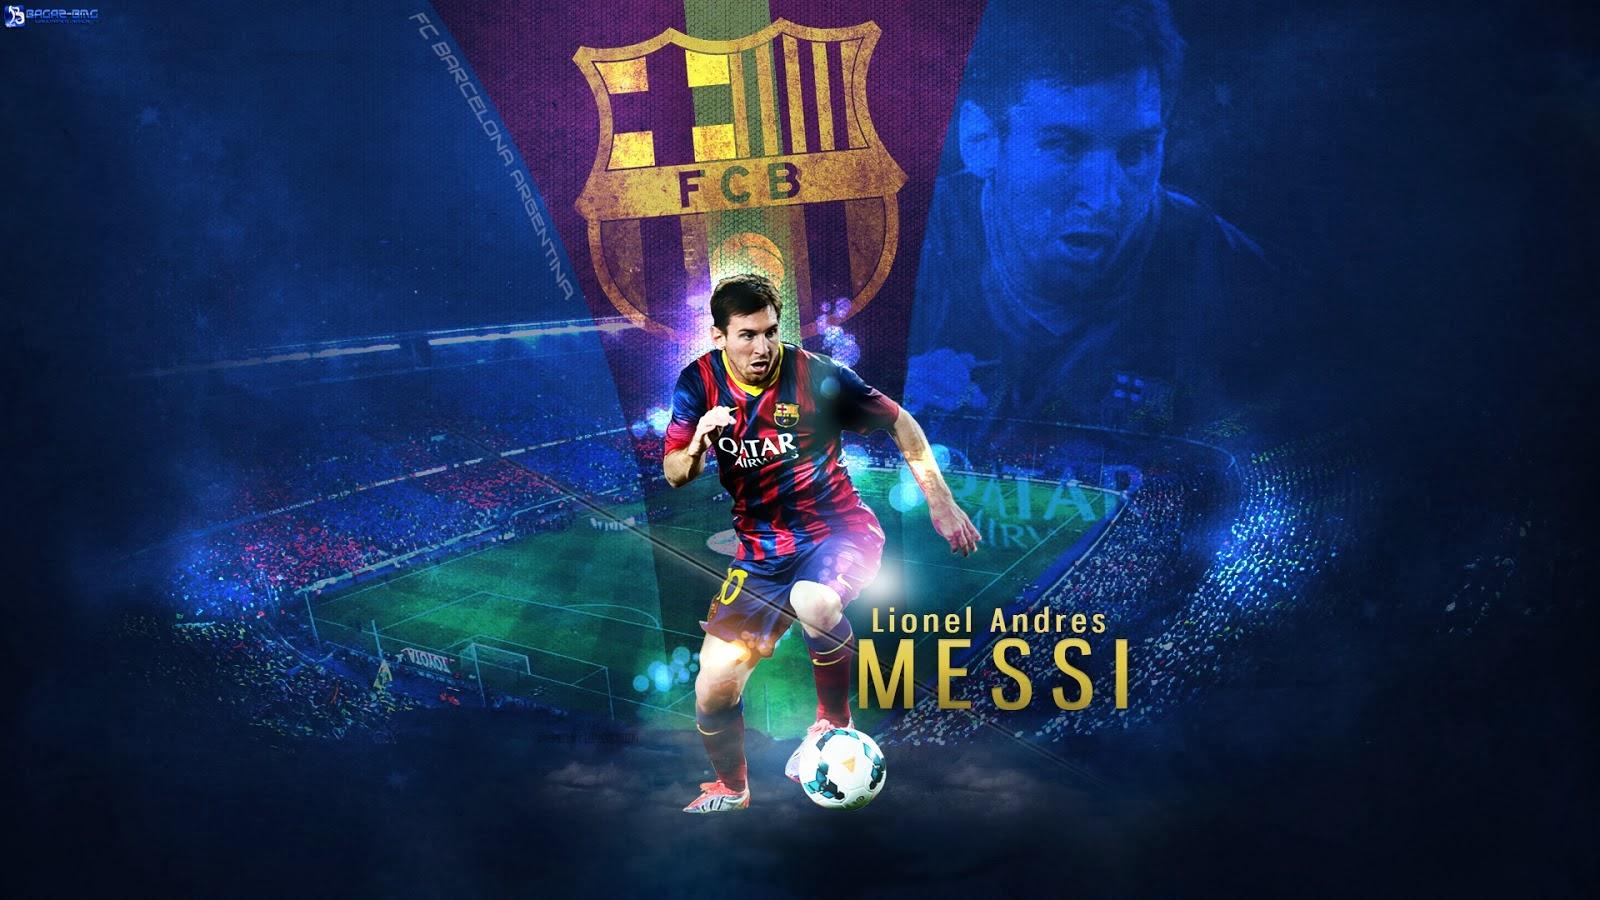 Los Fondos De Pantalla Animados Deportes Para Android: Patada De Caballo: Messi Wallpaper